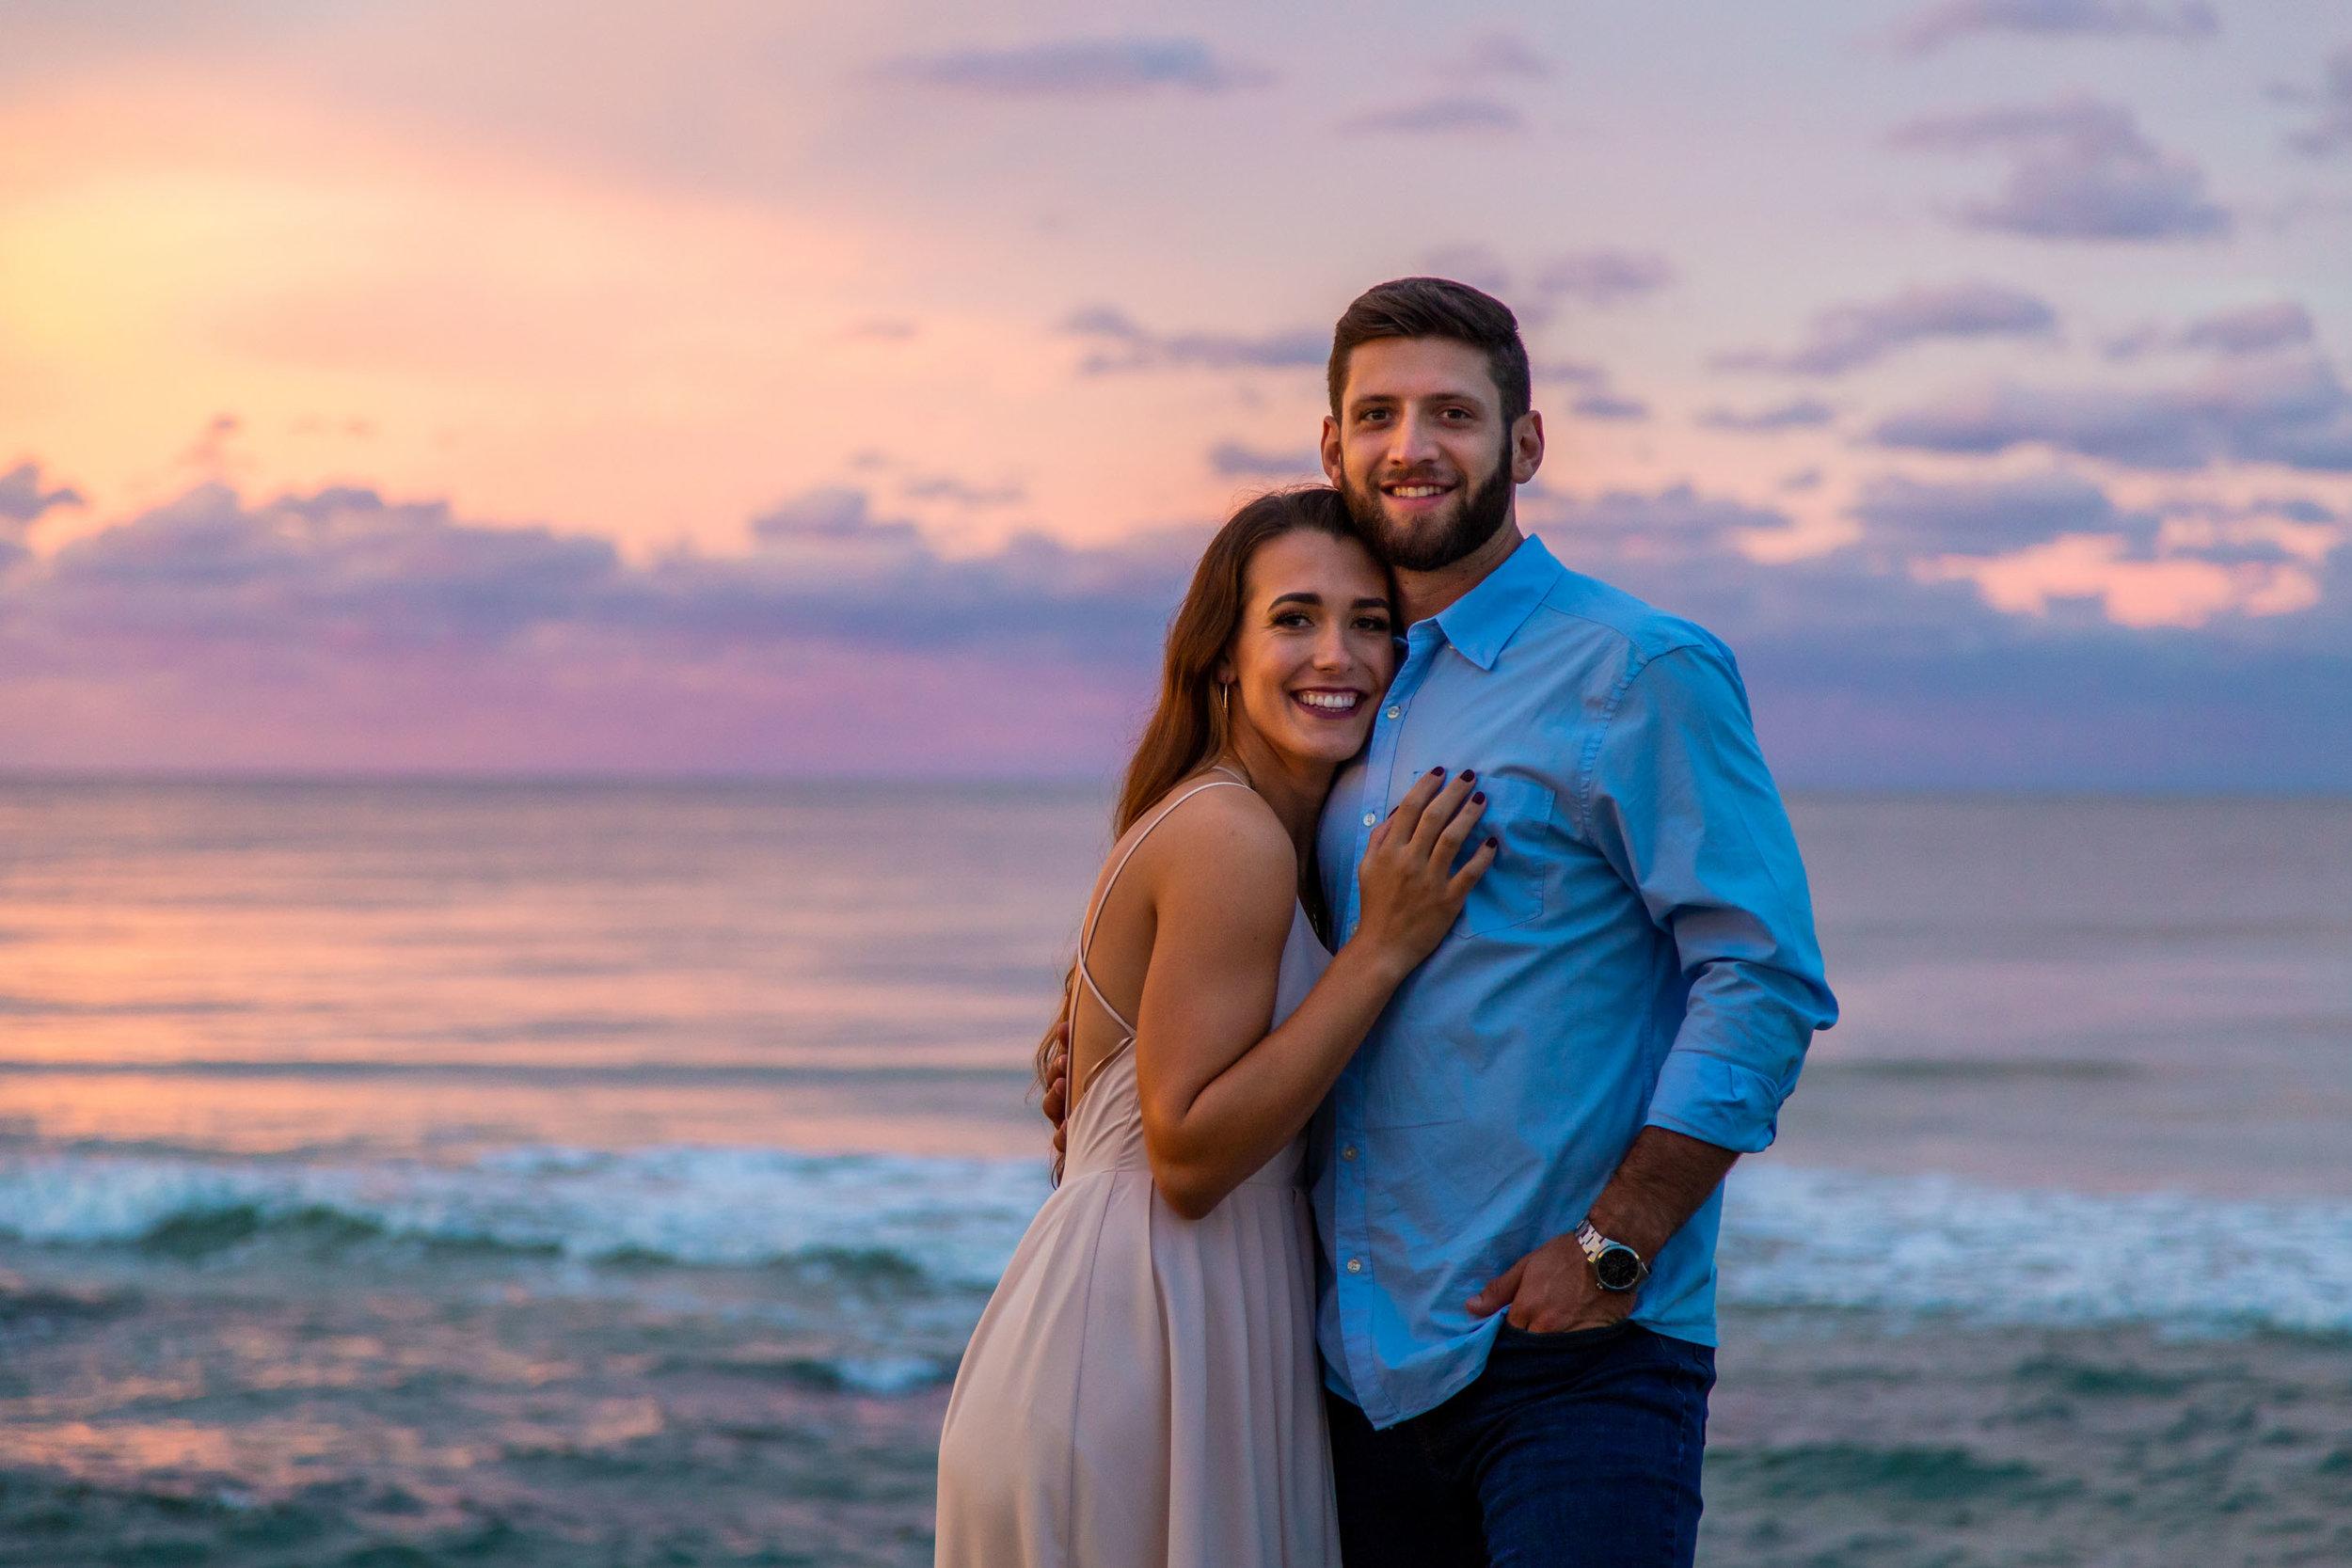 adam-szarmack-jacksonville-wedding-photographer-palm-coast-washing-oaks-garden-state-park-engagement-61.jpg